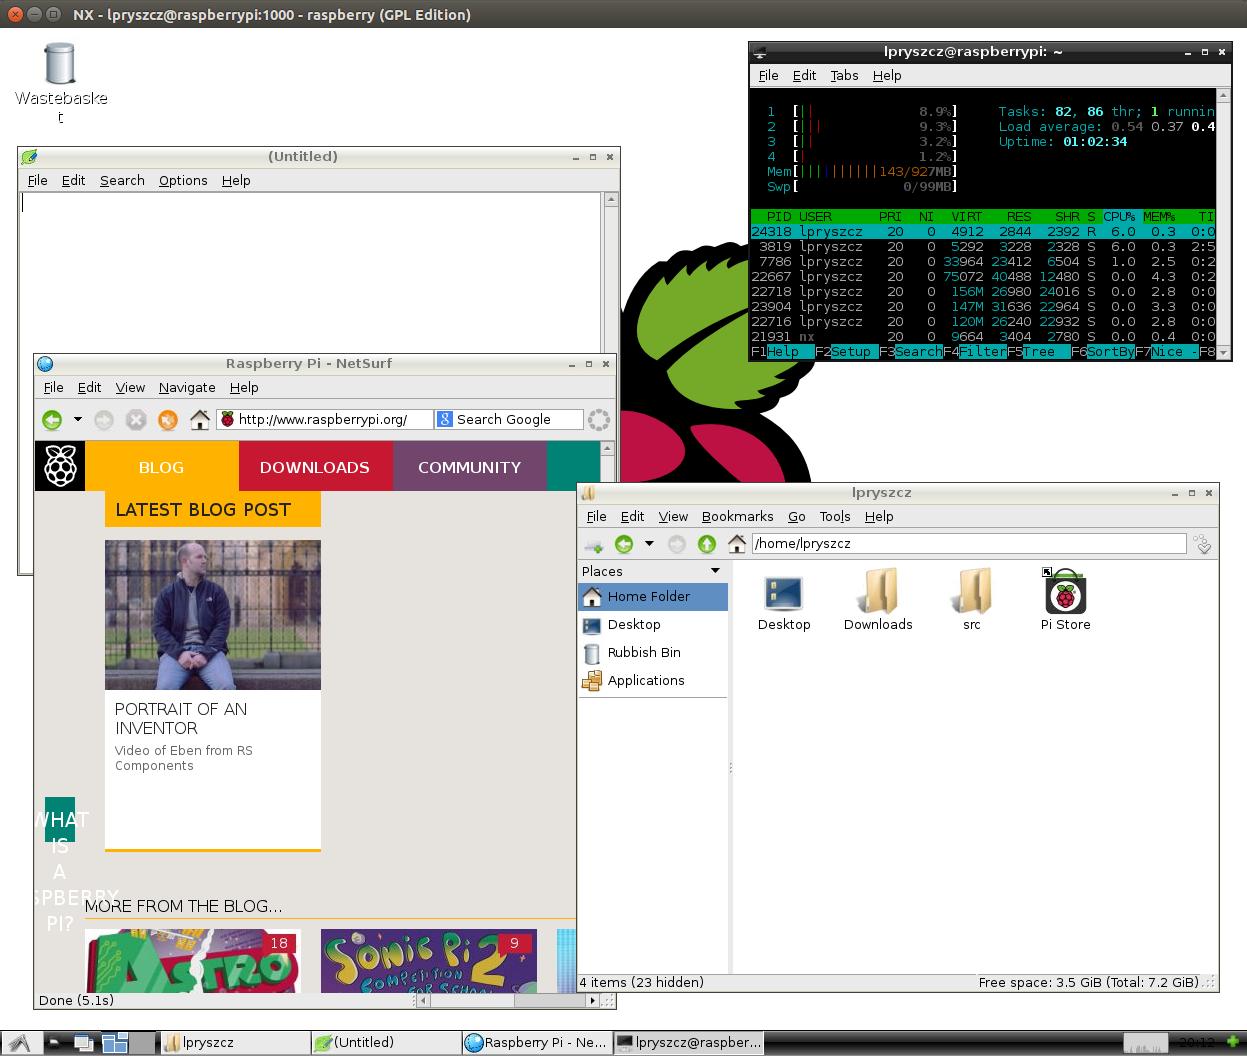 Raspberry Pi 2 over NX